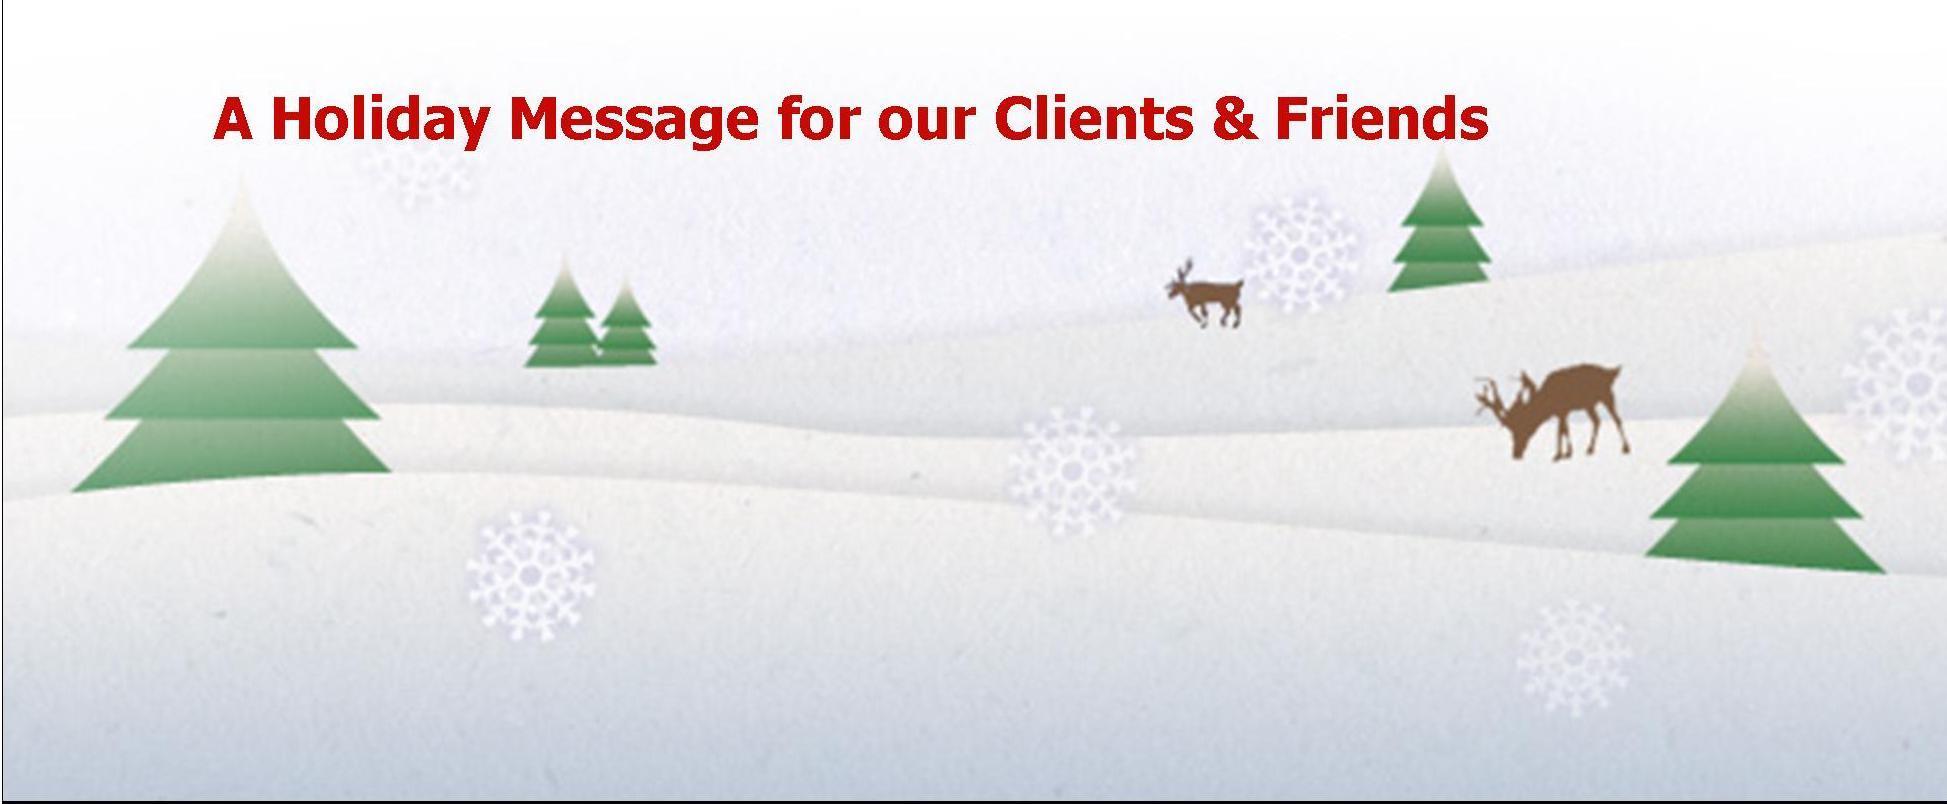 Happy Holidays from Elliot Whittier Insurance!